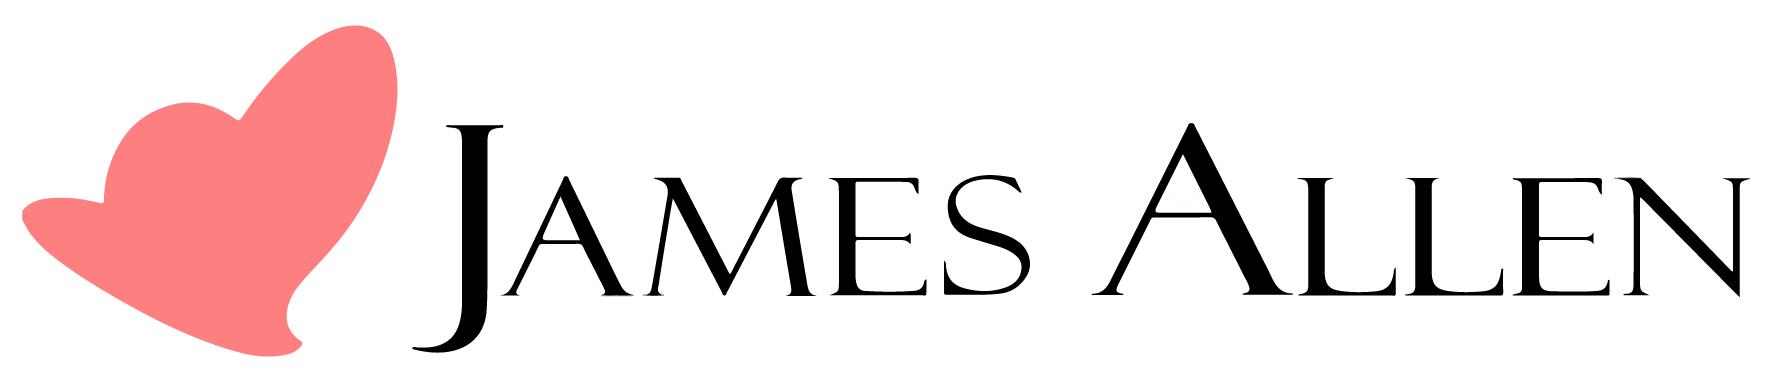 james-allen_logo.png